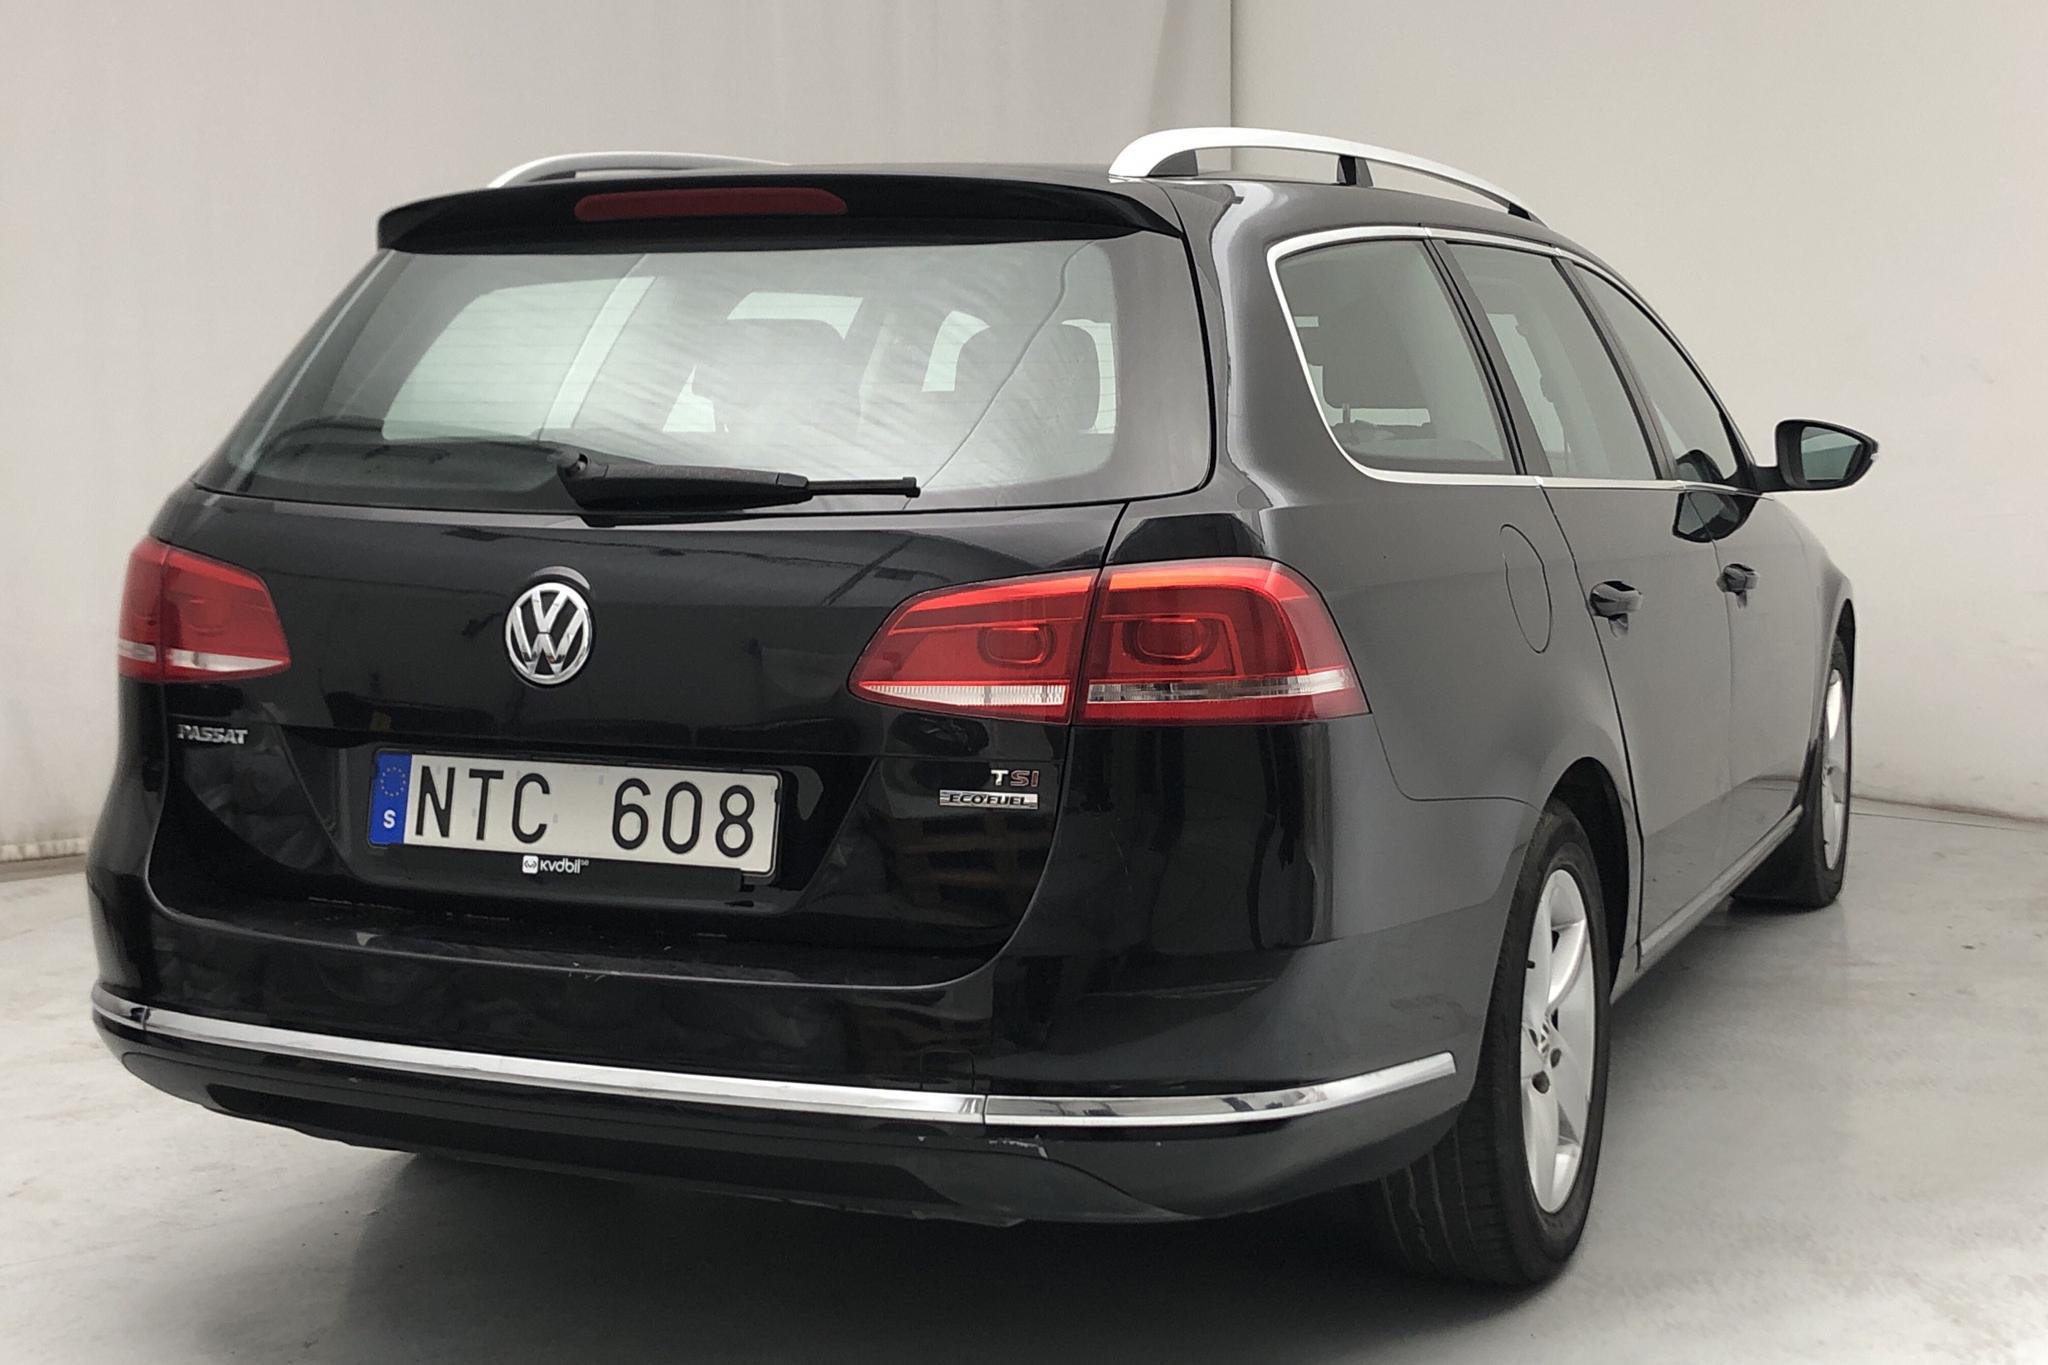 VW Passat 1.4 TSI EcoFuel Variant (150hk) - 16 501 mil - Manuell - svart - 2011